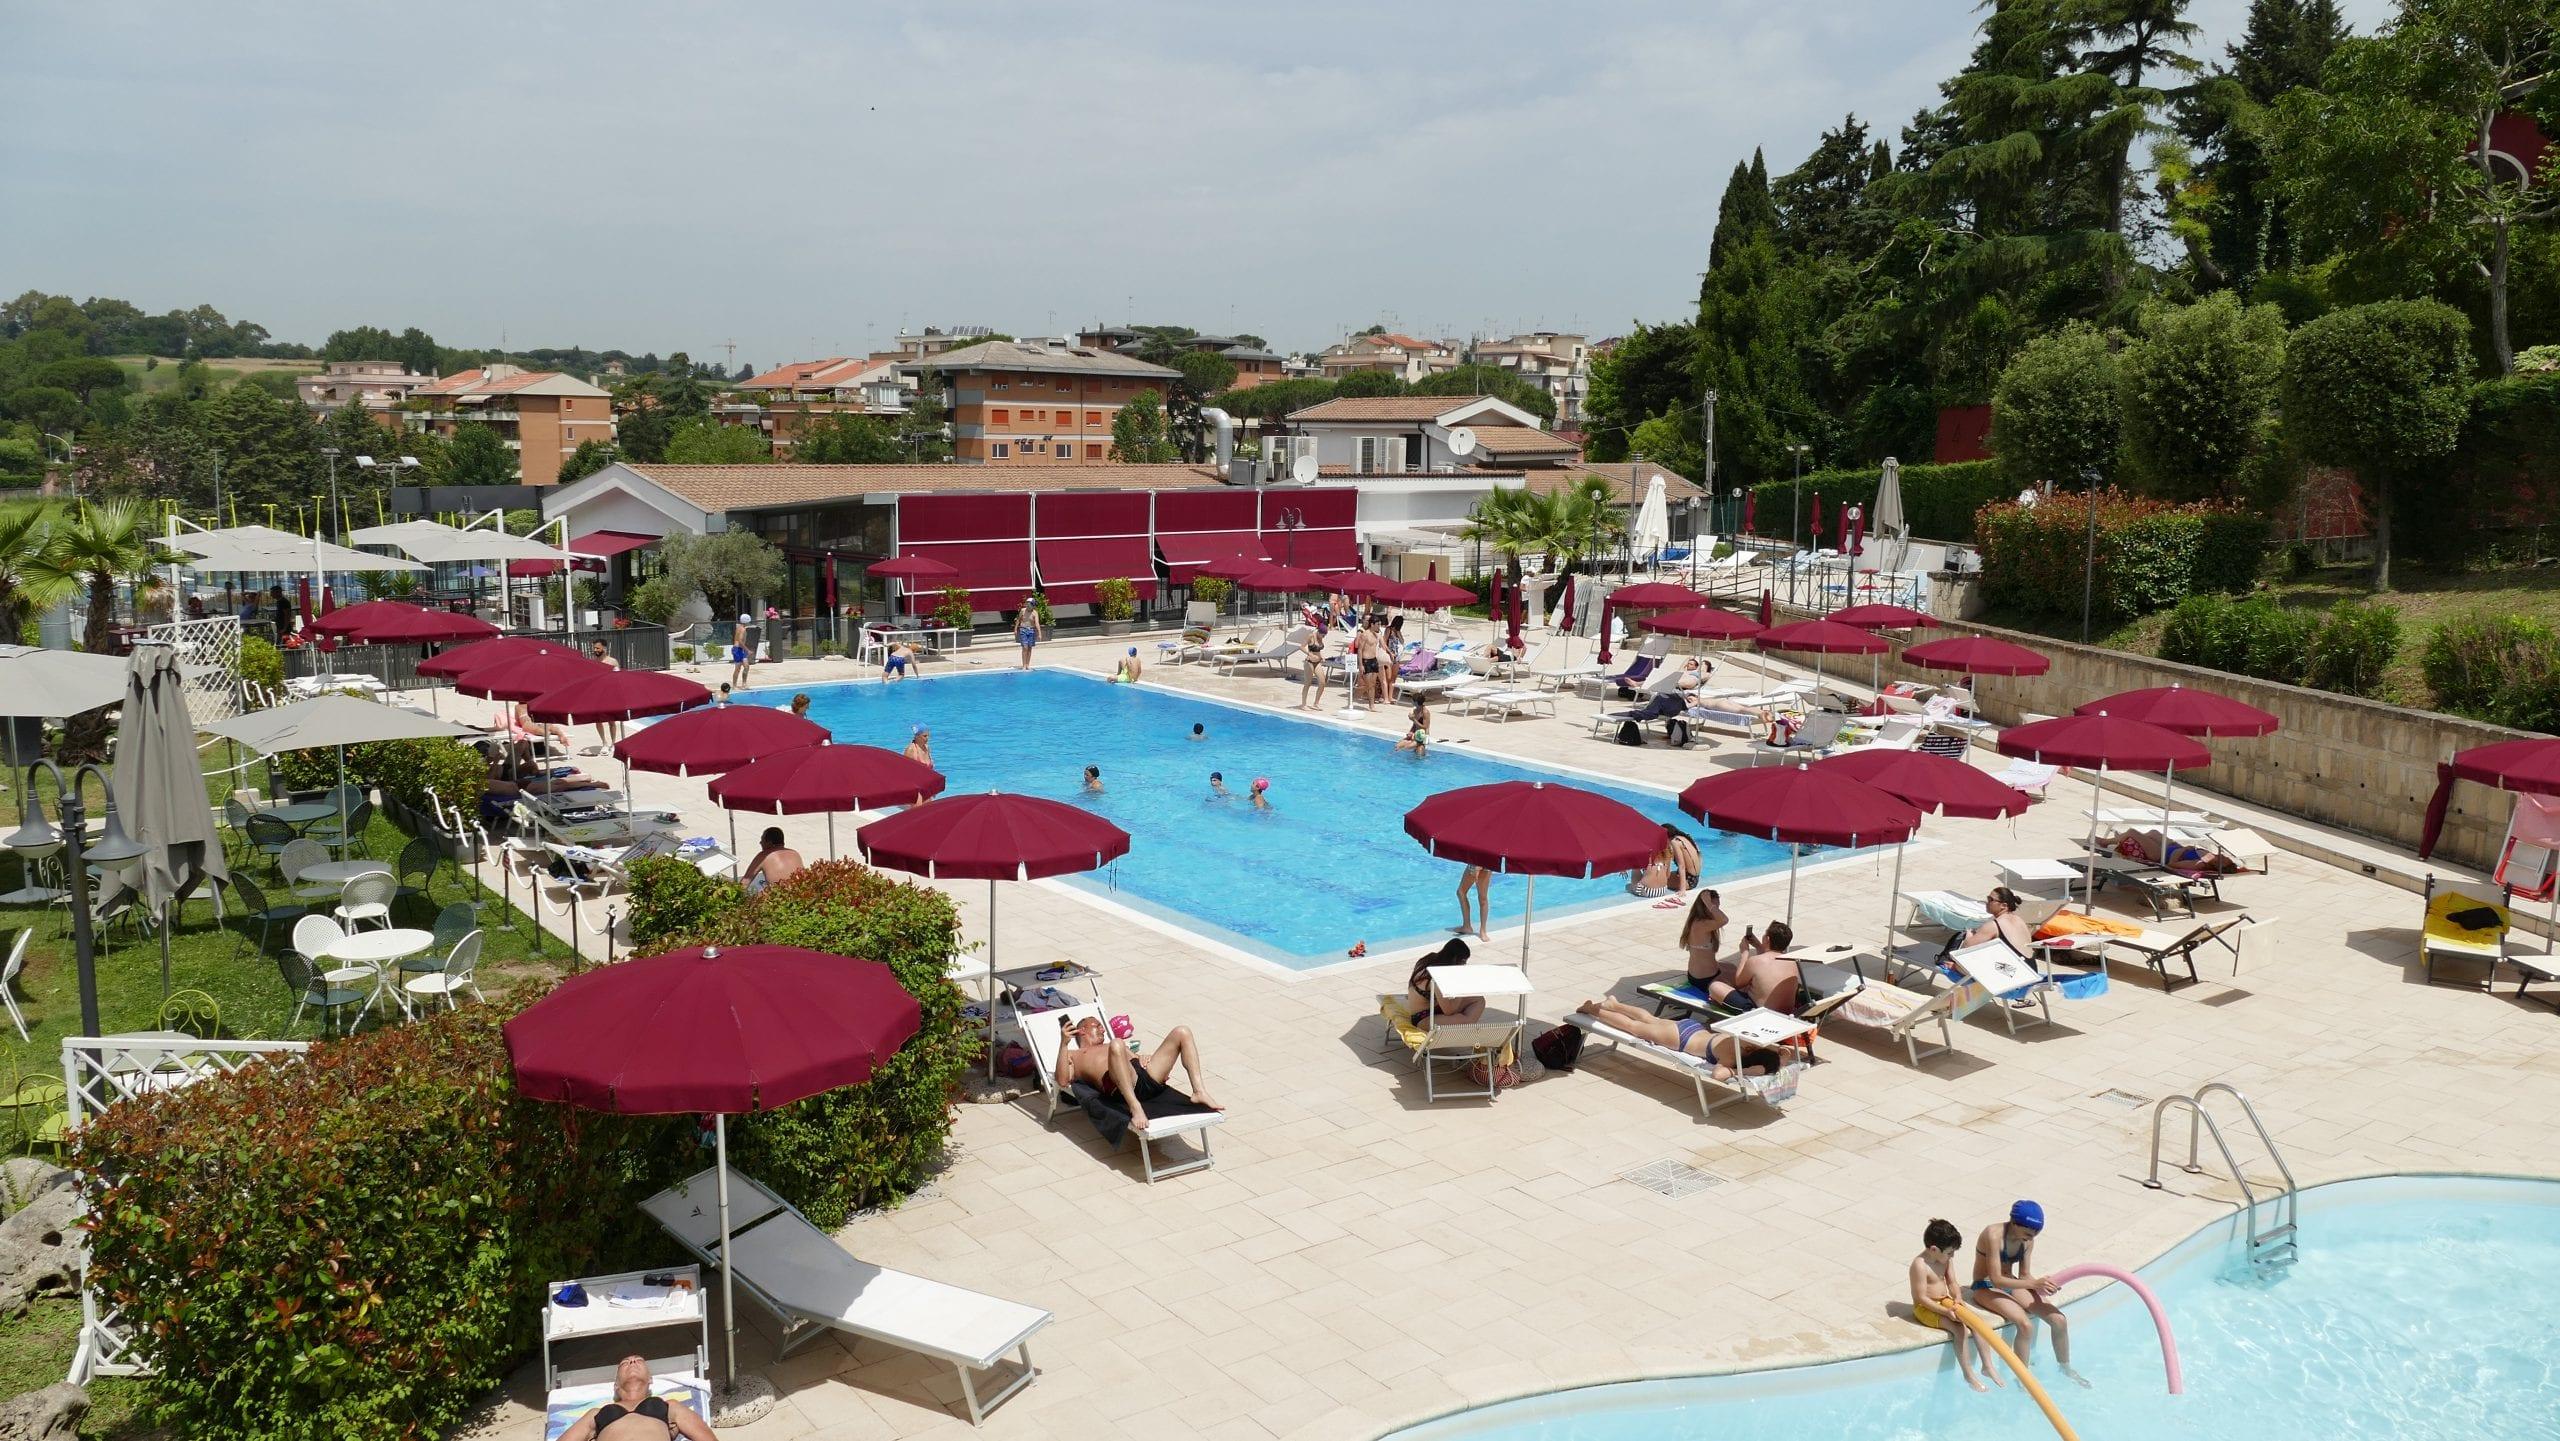 La piscina di Rosciolino al Play Pisana